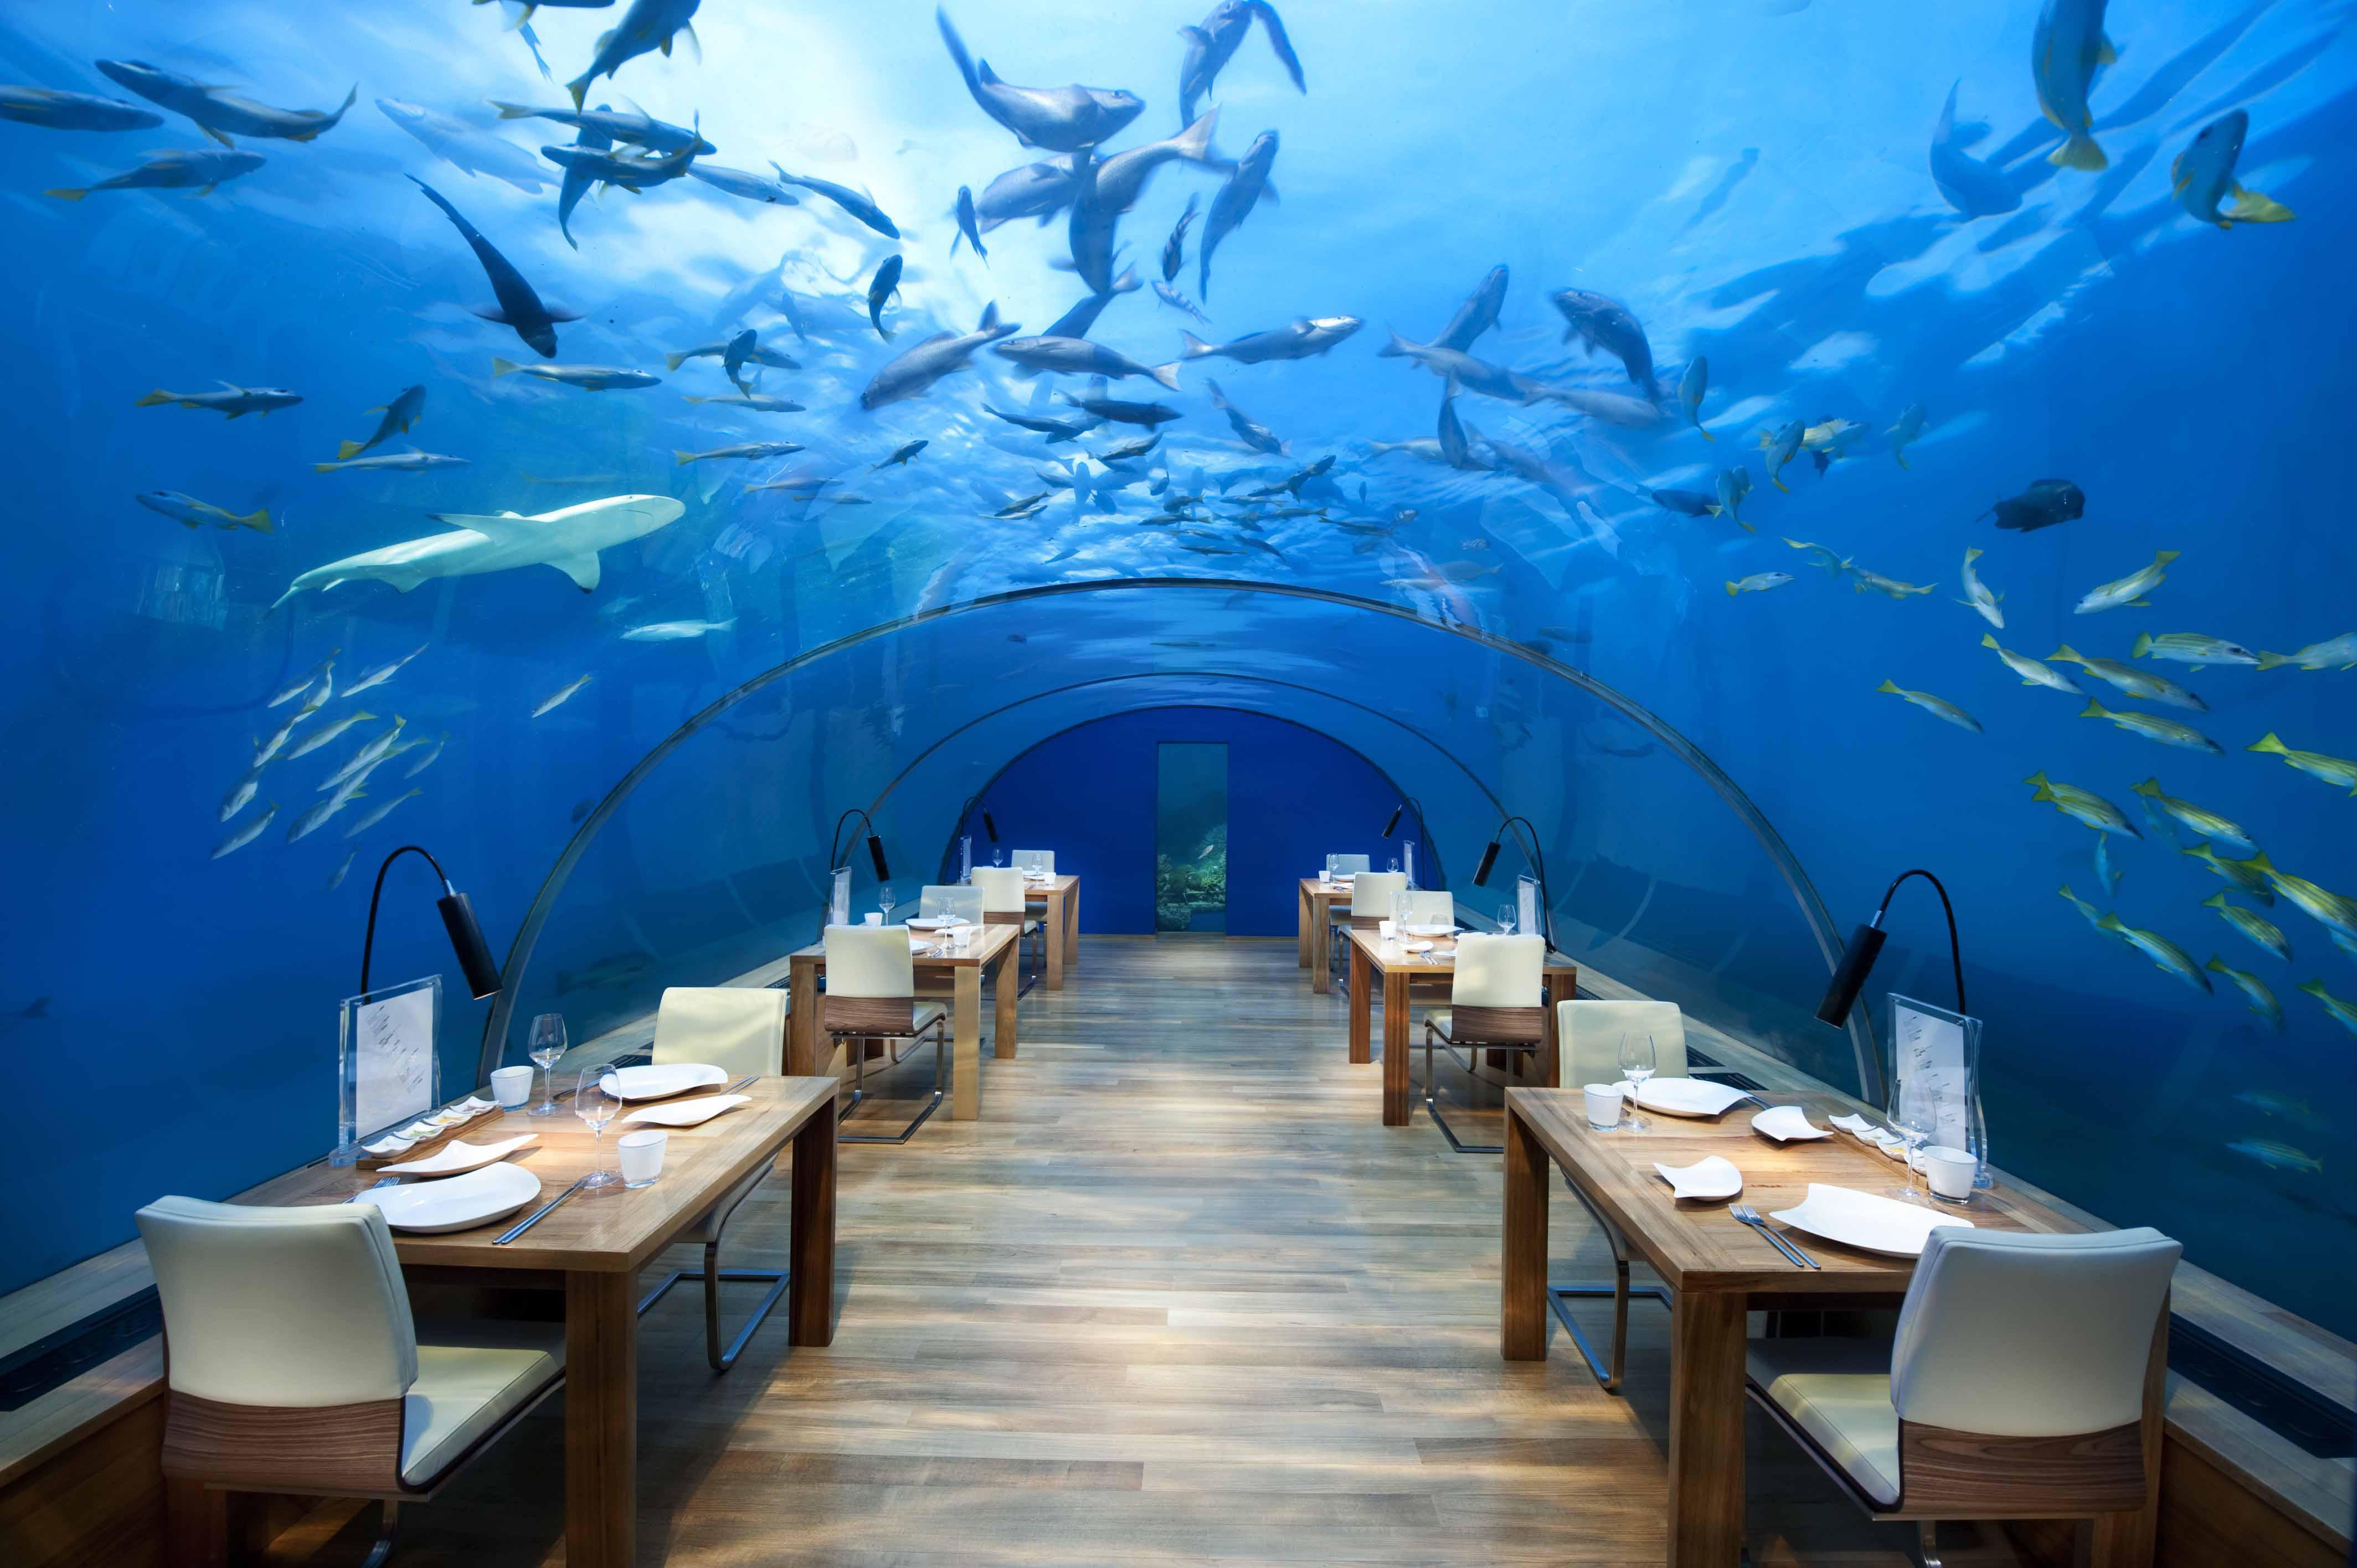 Restaurantes bajo el mar IthaaUnderseaRestaurant2